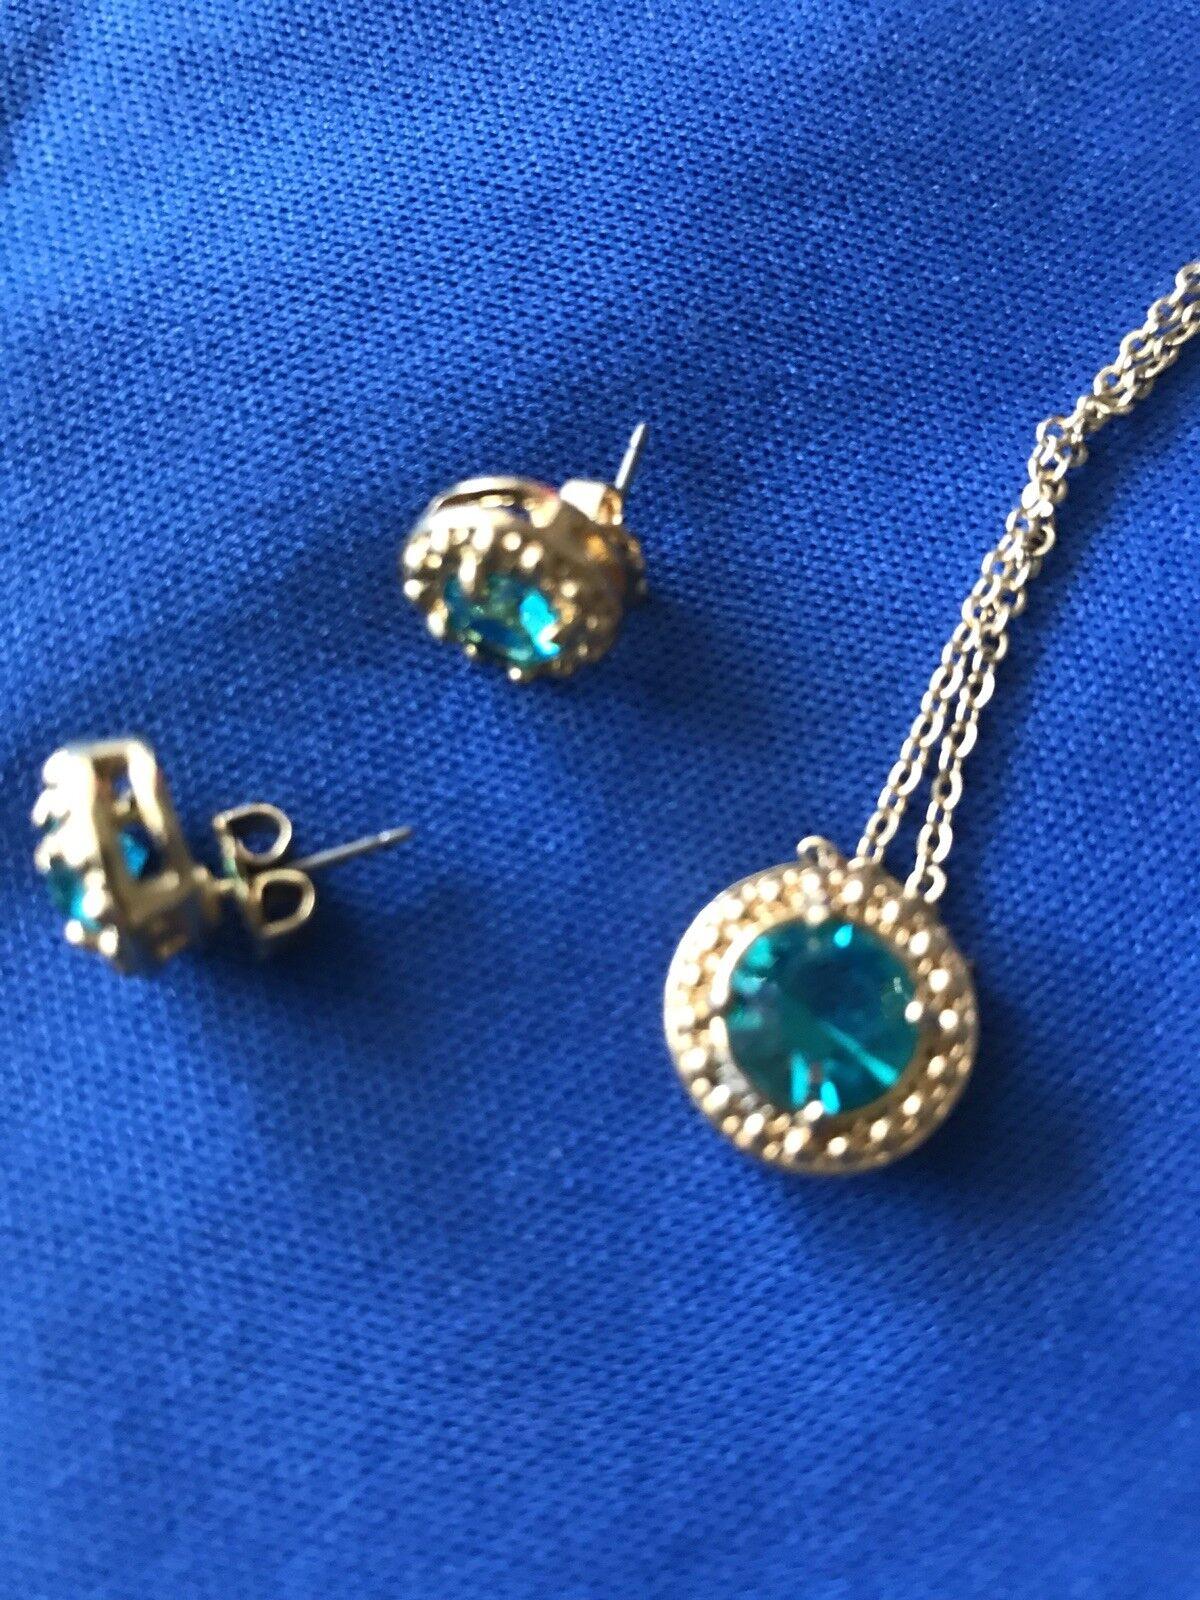 Rhinestone Earrings and Pendant Set Avon